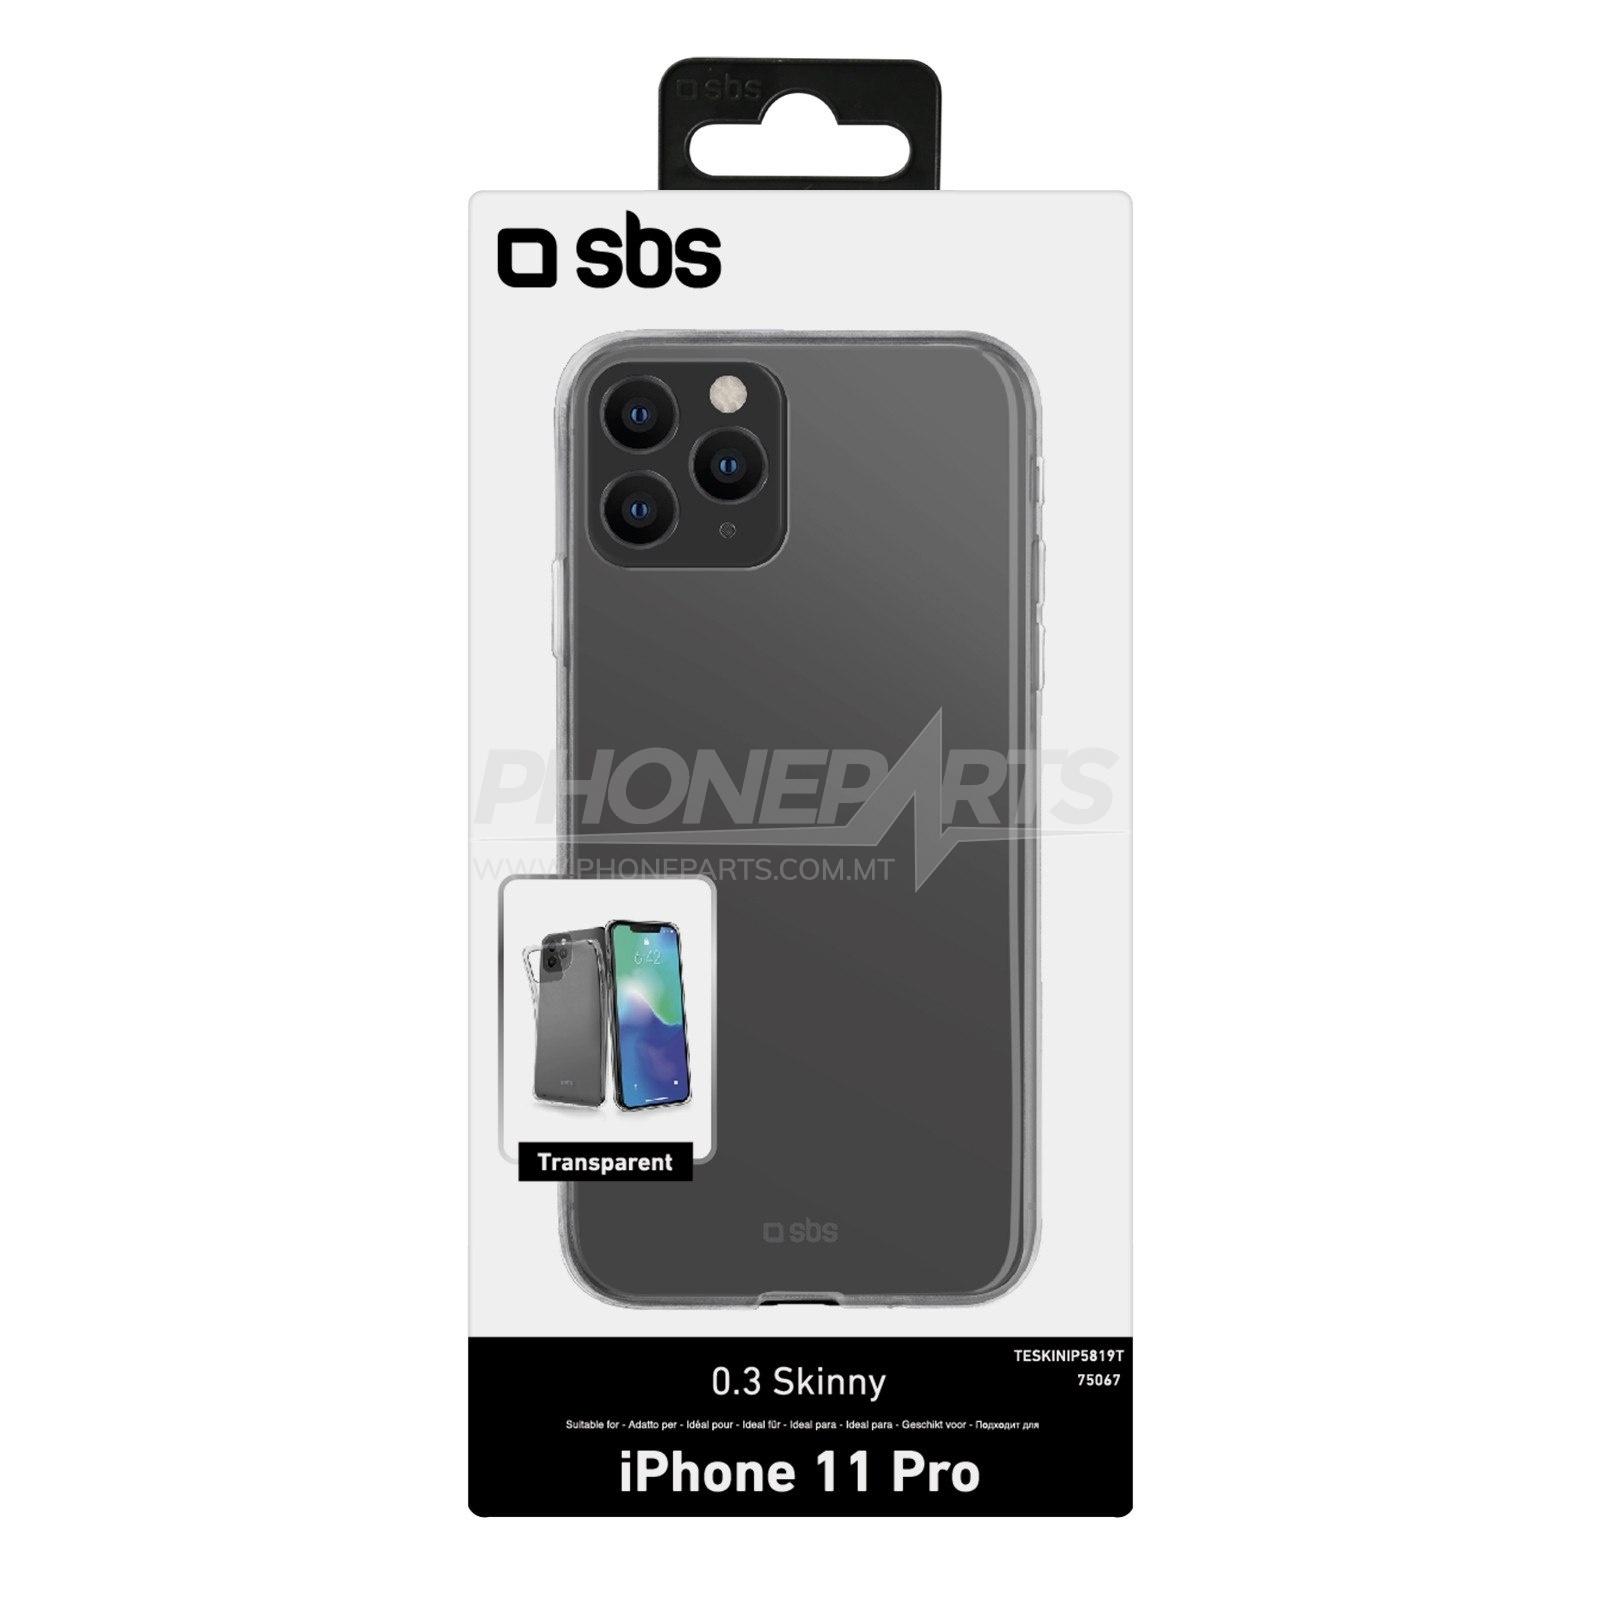 SBS Cover Skinny per Huawei P8 Lite 2017/P9 Lite 2017/Honor 8 Lite/Nova Lite